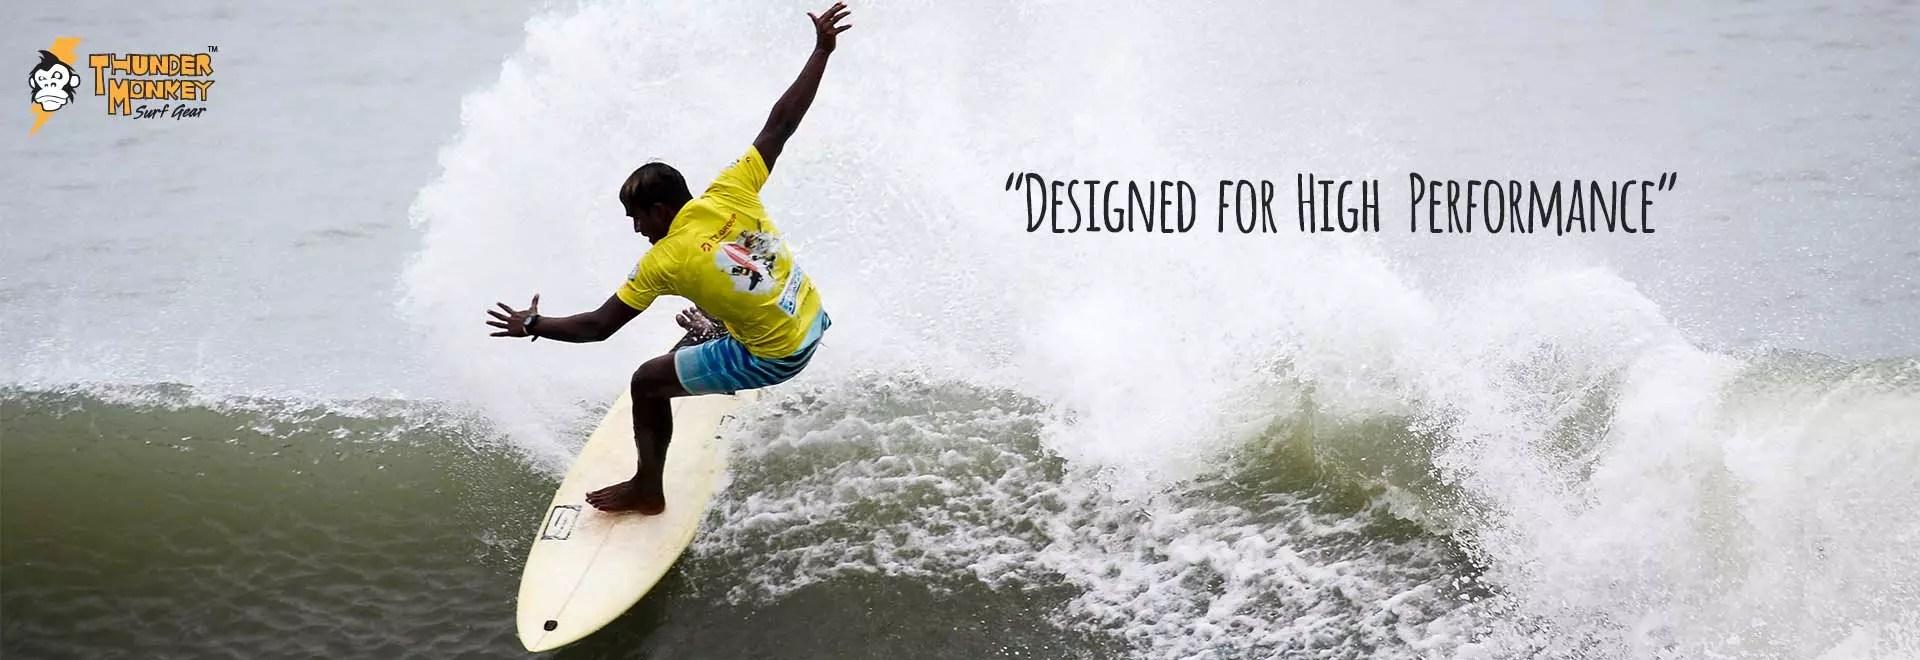 Thunder Monkey Surf Gear India - Board Shorts